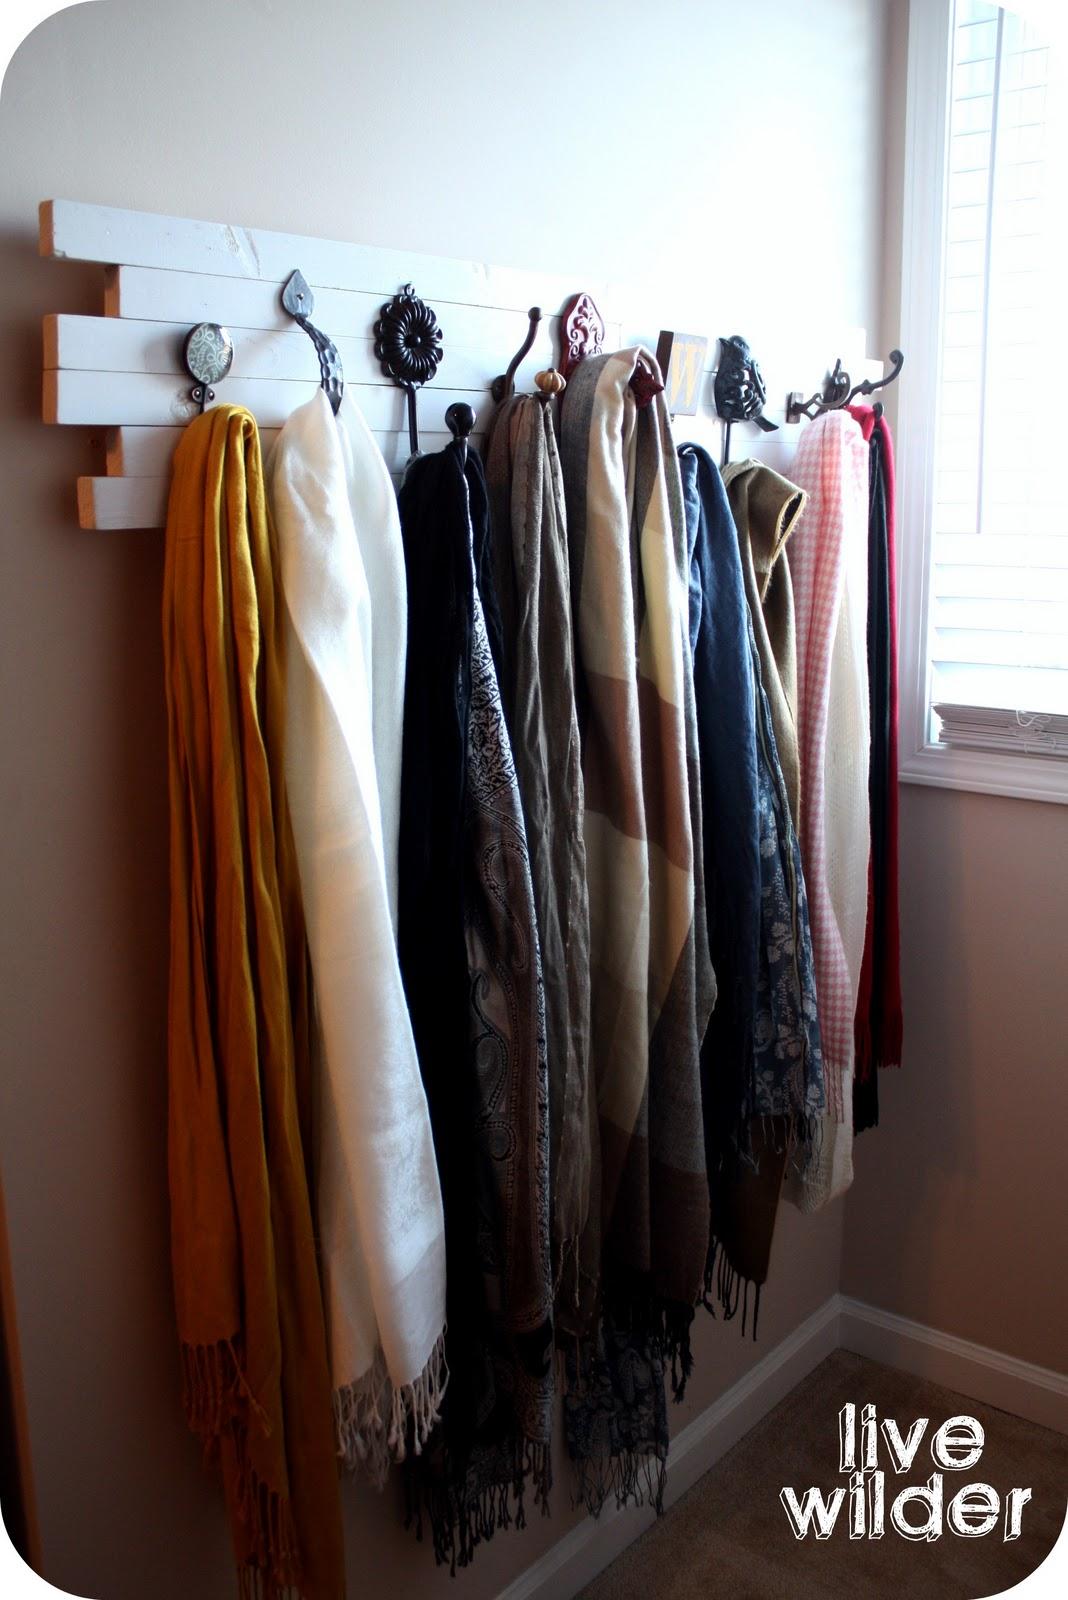 live a wilder the scarf hanger tutorial